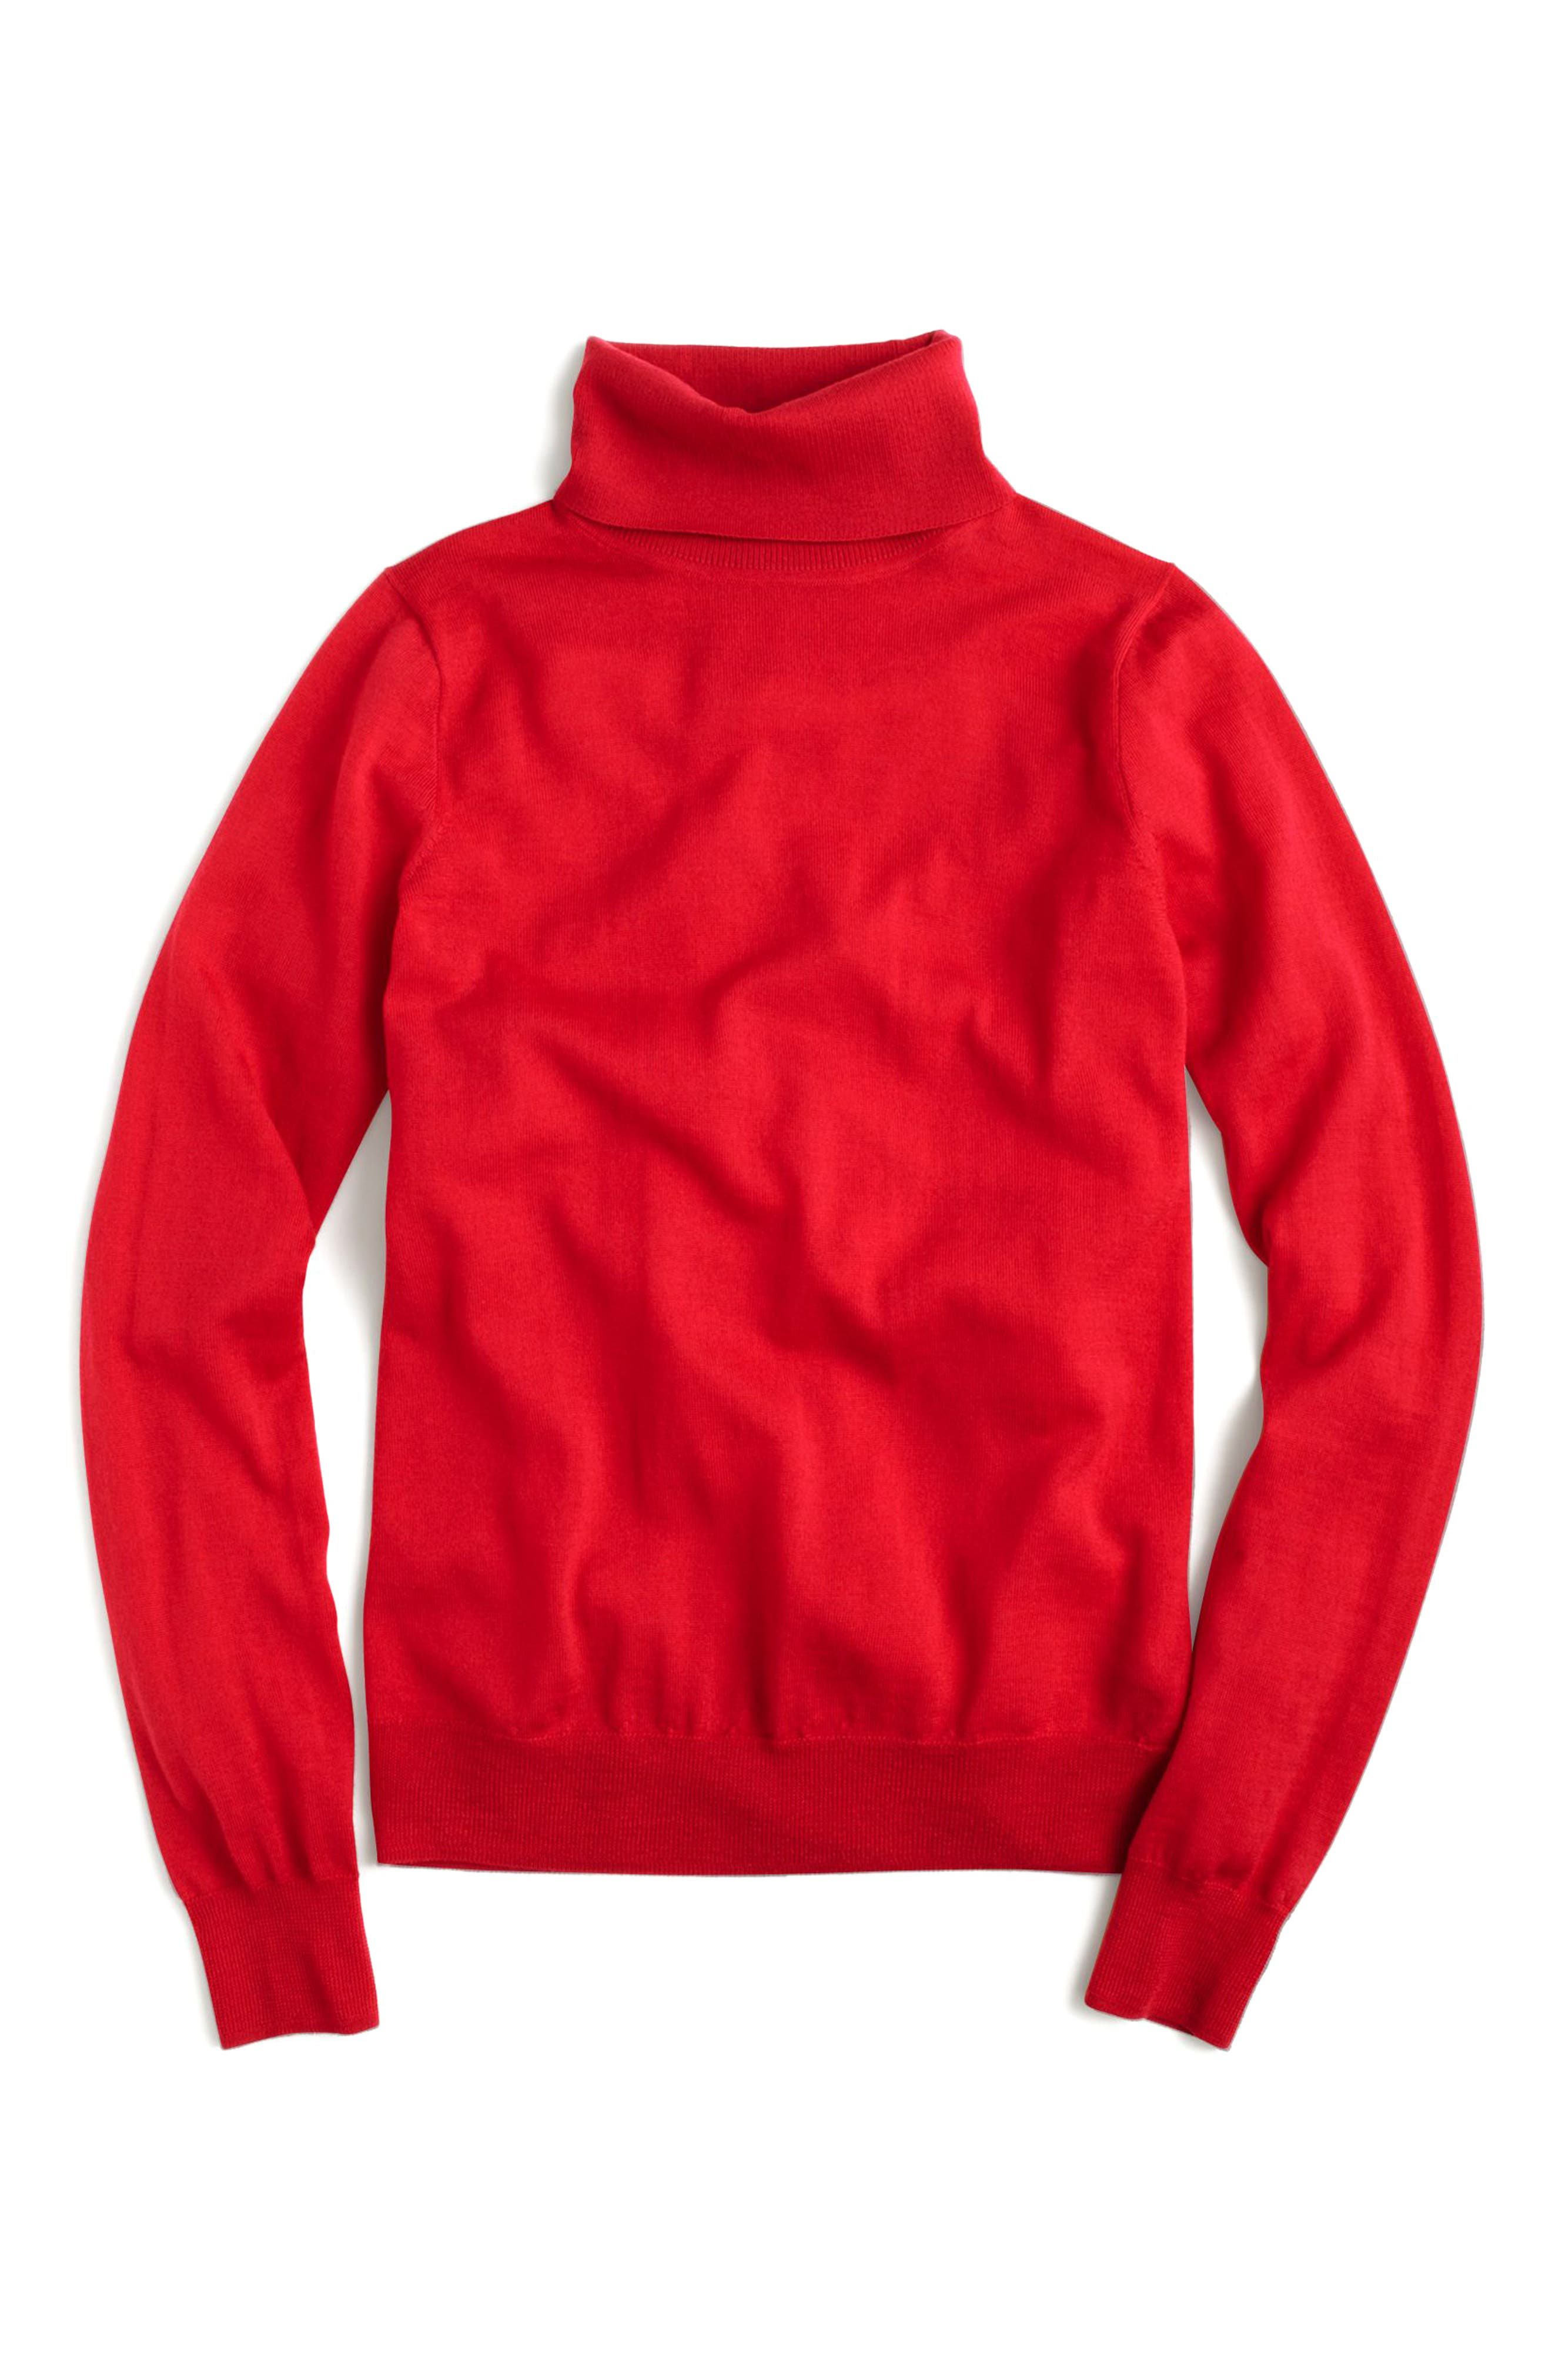 Alternate Image 1 Selected - J.Crew Tippi Turtleneck Sweater